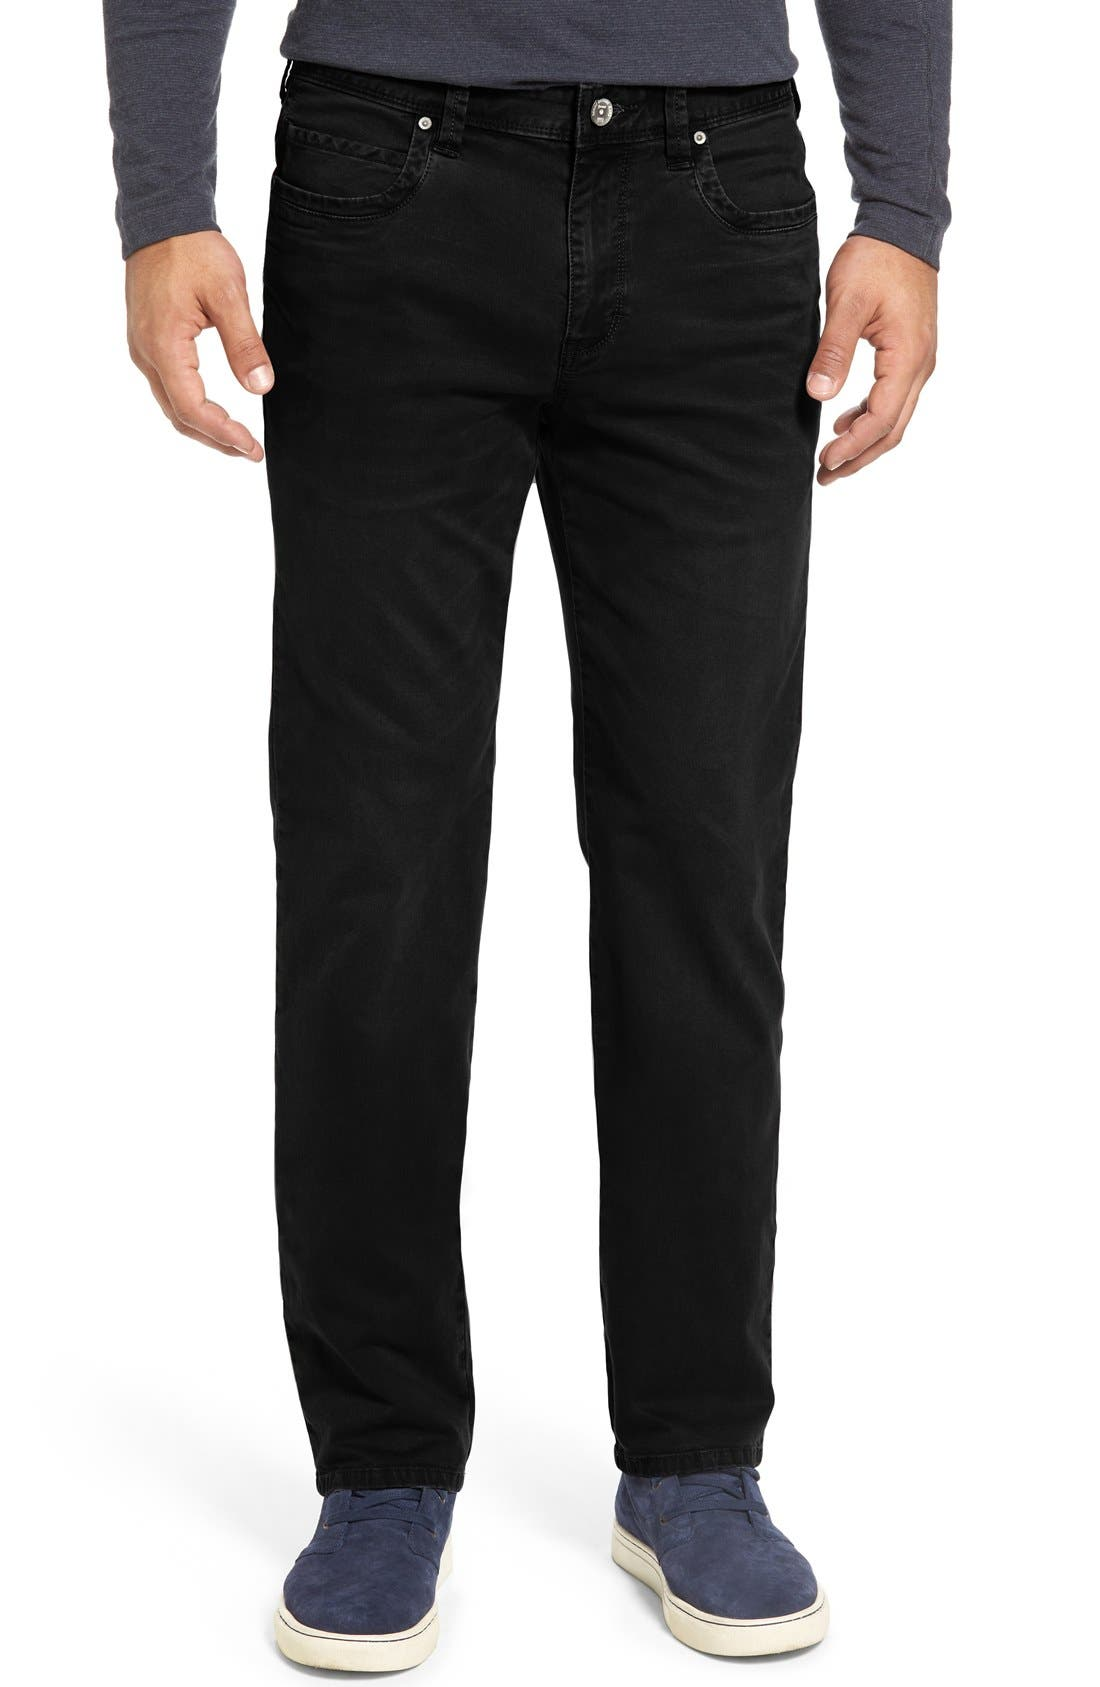 'Santiago' Washed Twill Pants,                         Main,                         color, Black